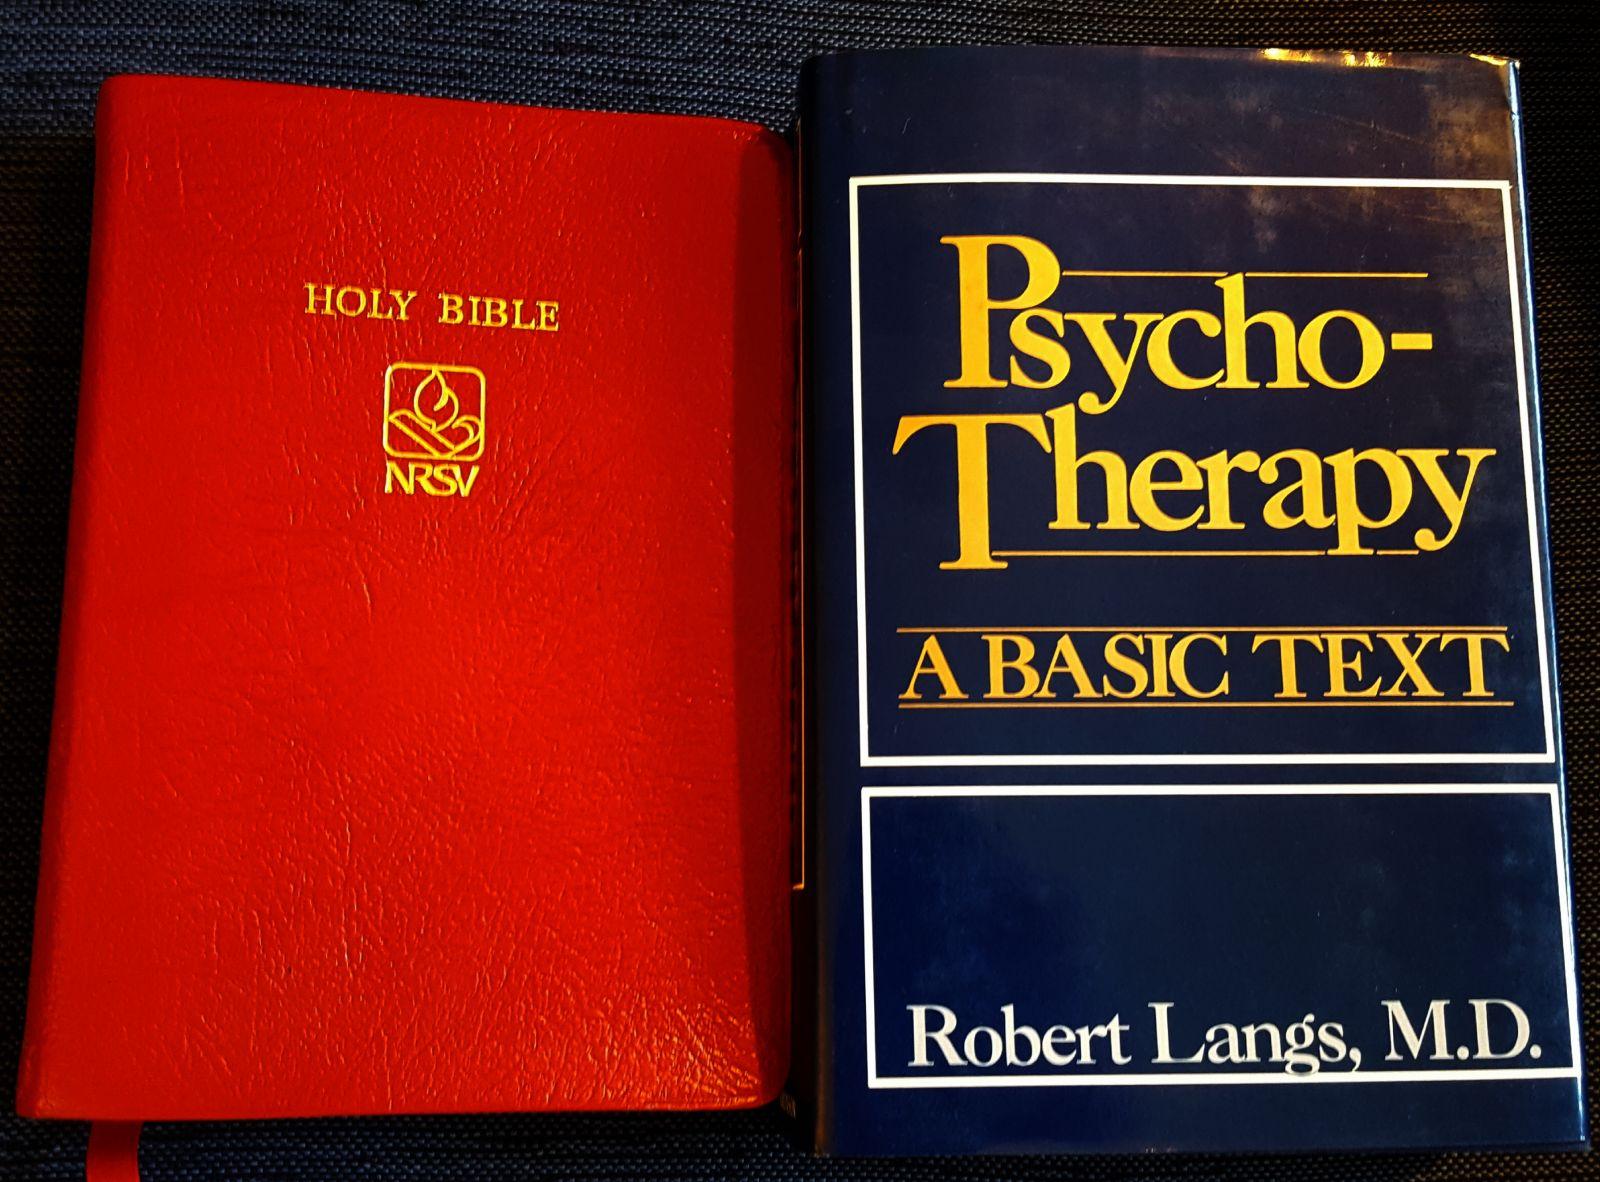 Understanding the Parallels between Biblical and Psychological Wisdom